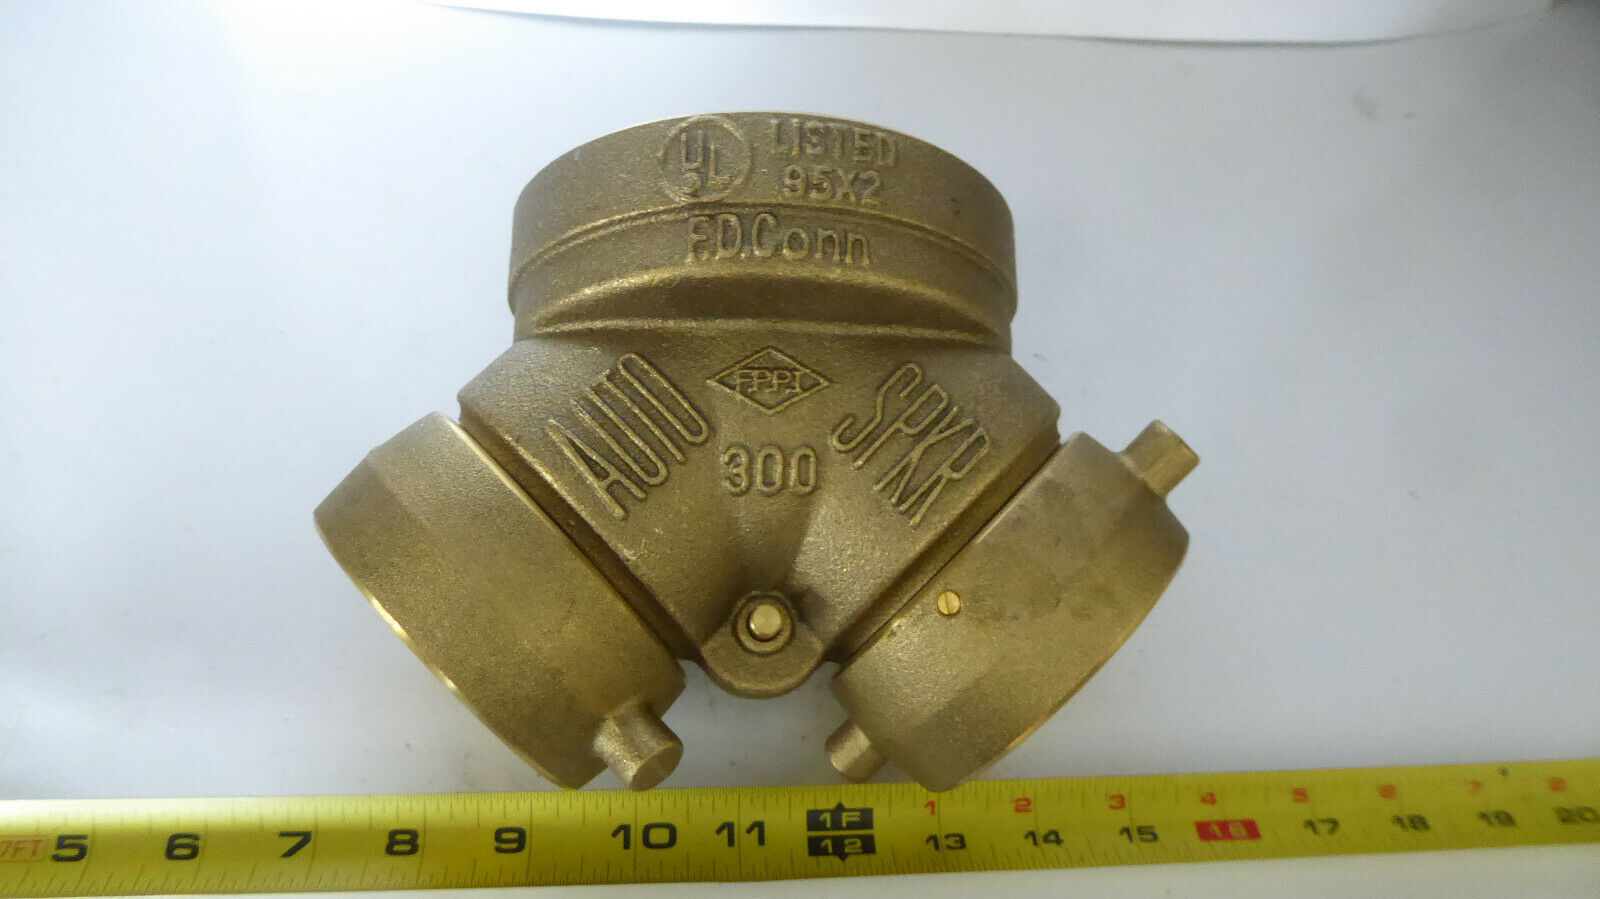 FDC Auto Spkr 300 09-000 Fire Protection Valve Brass New